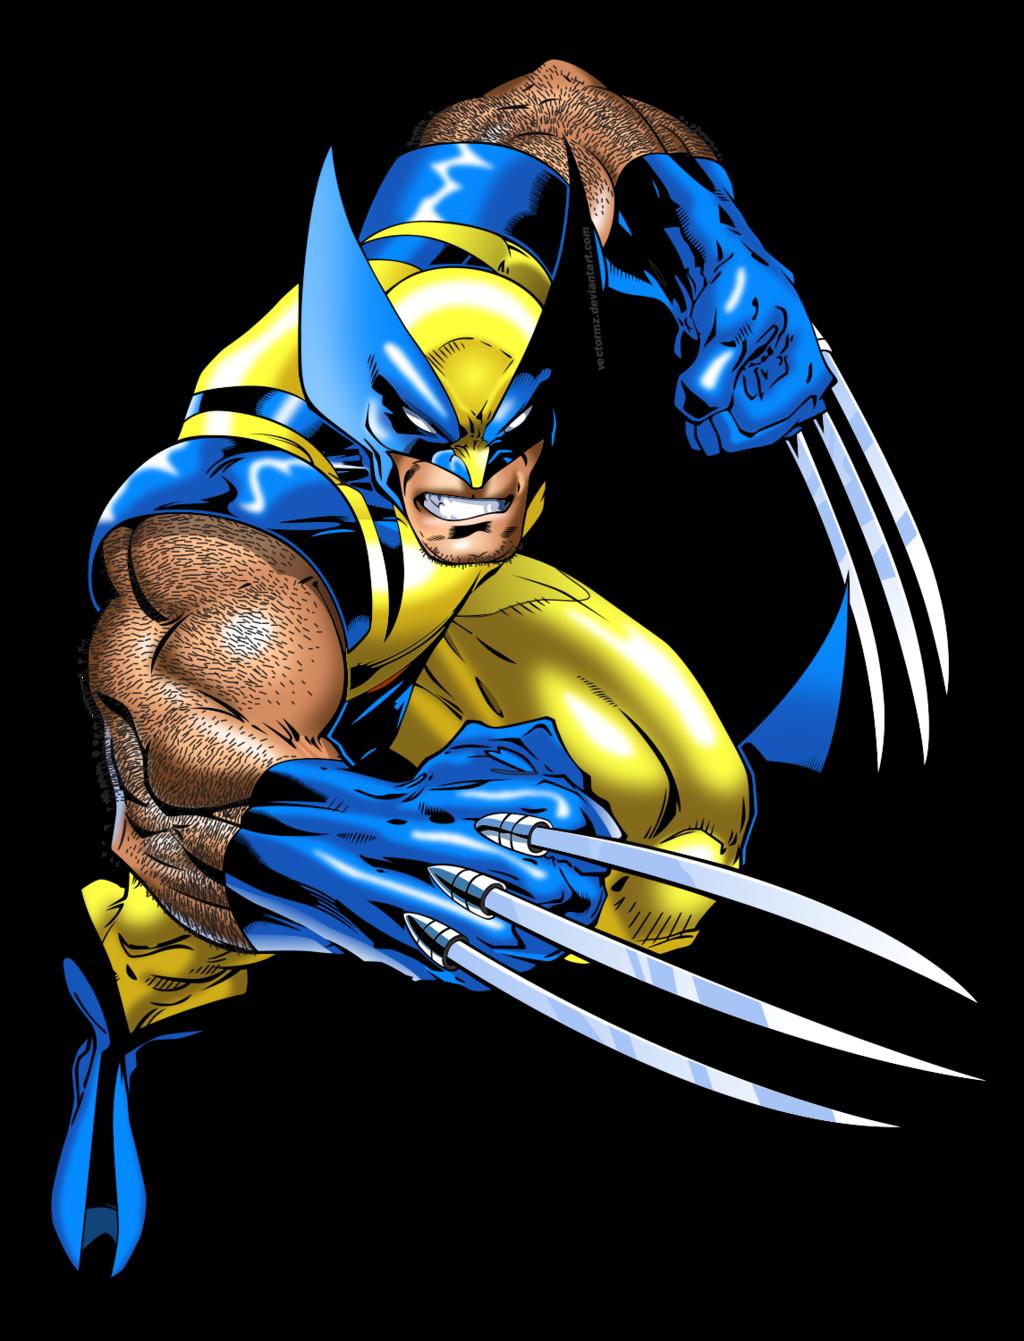 HQ Wolverine PNG Transparent Wolverine.PNG Images..